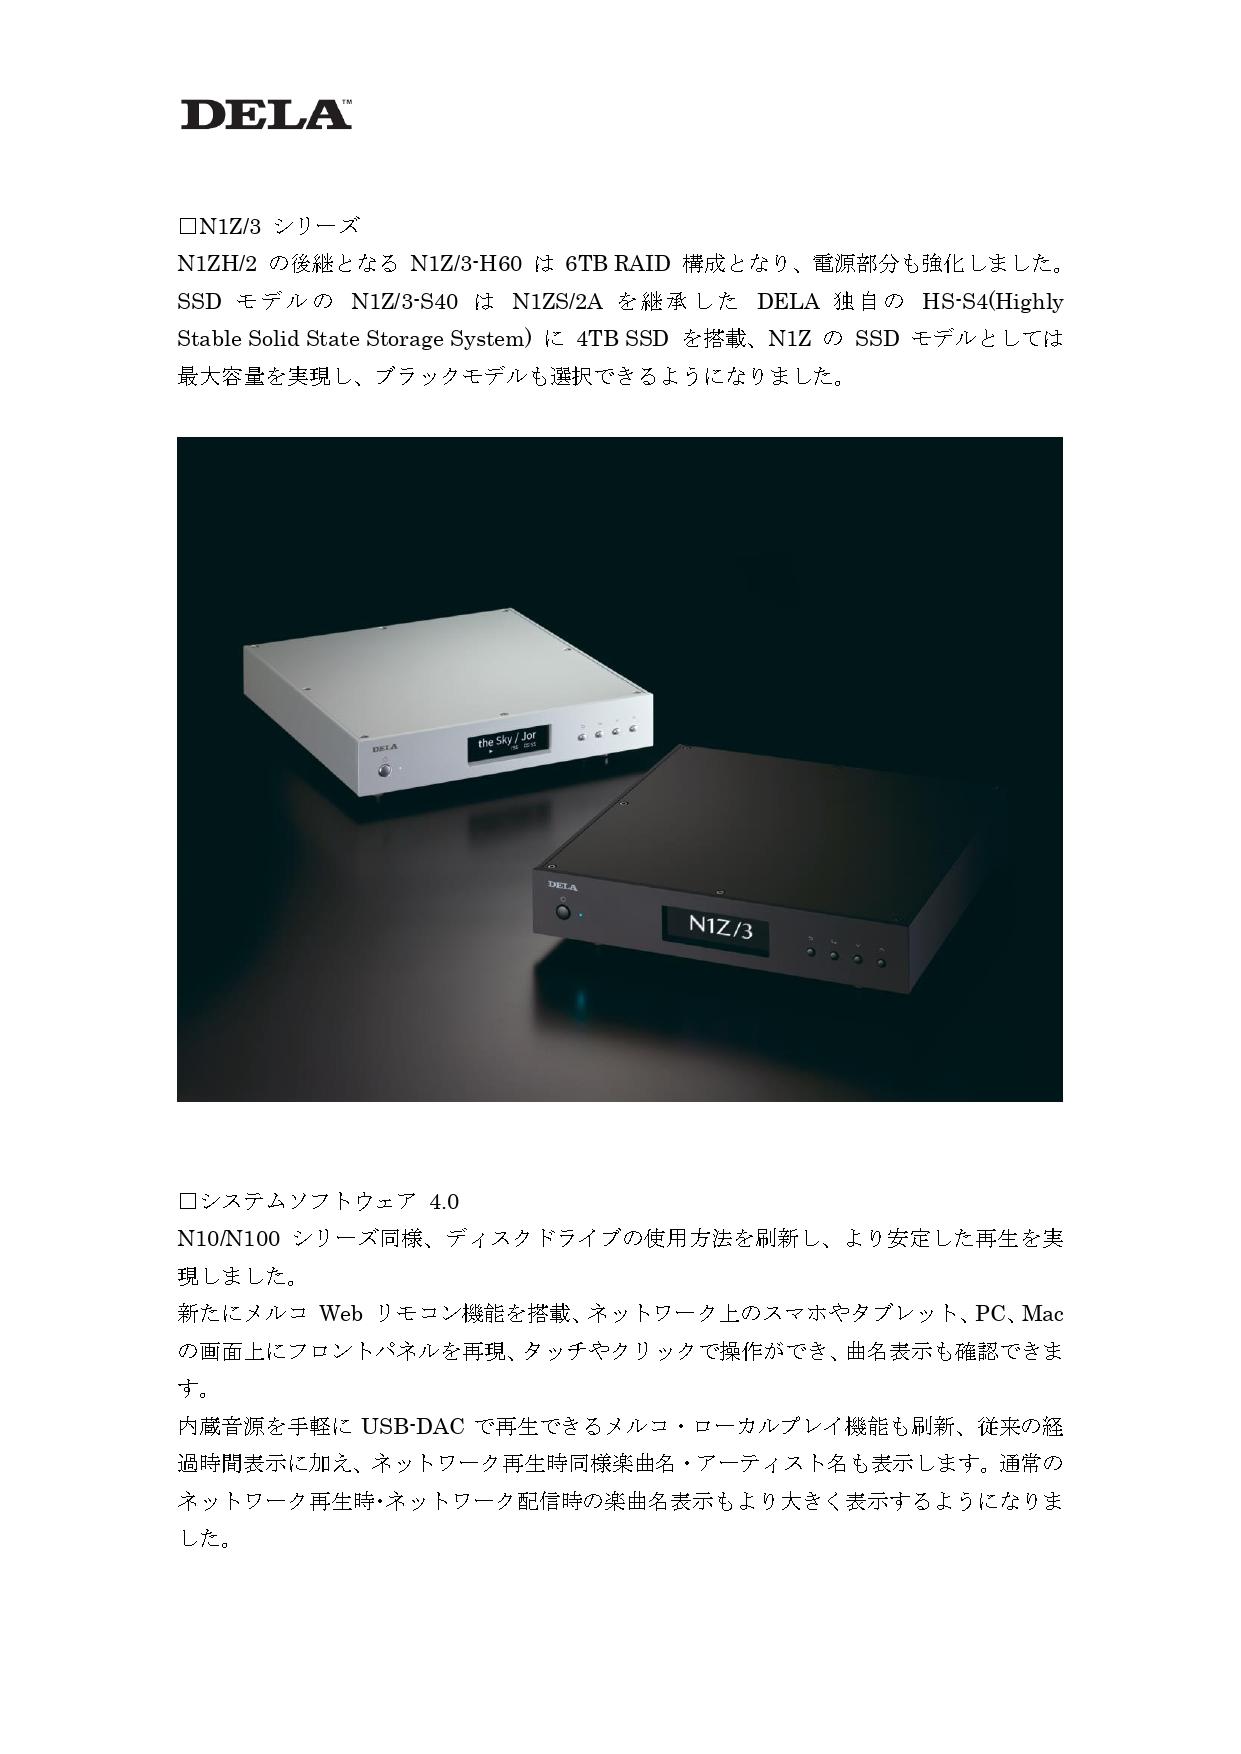 DELA 新製品 N1 MK3, S100_page-0003